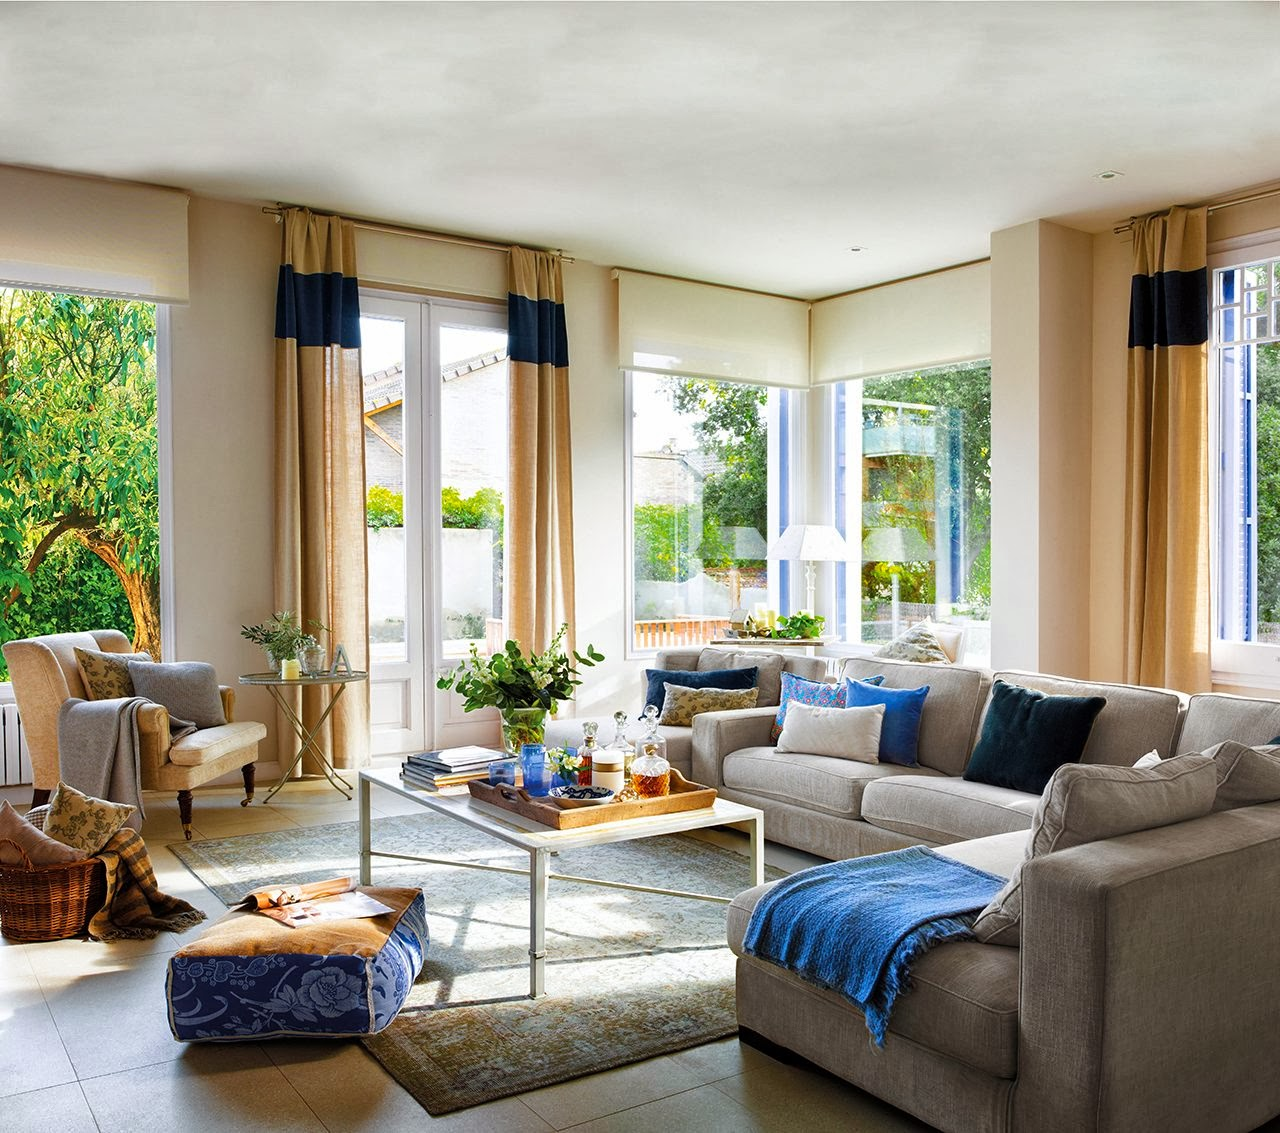 Amenajare n albastru jurnal de design interior - Decoracion casa pequenas ...